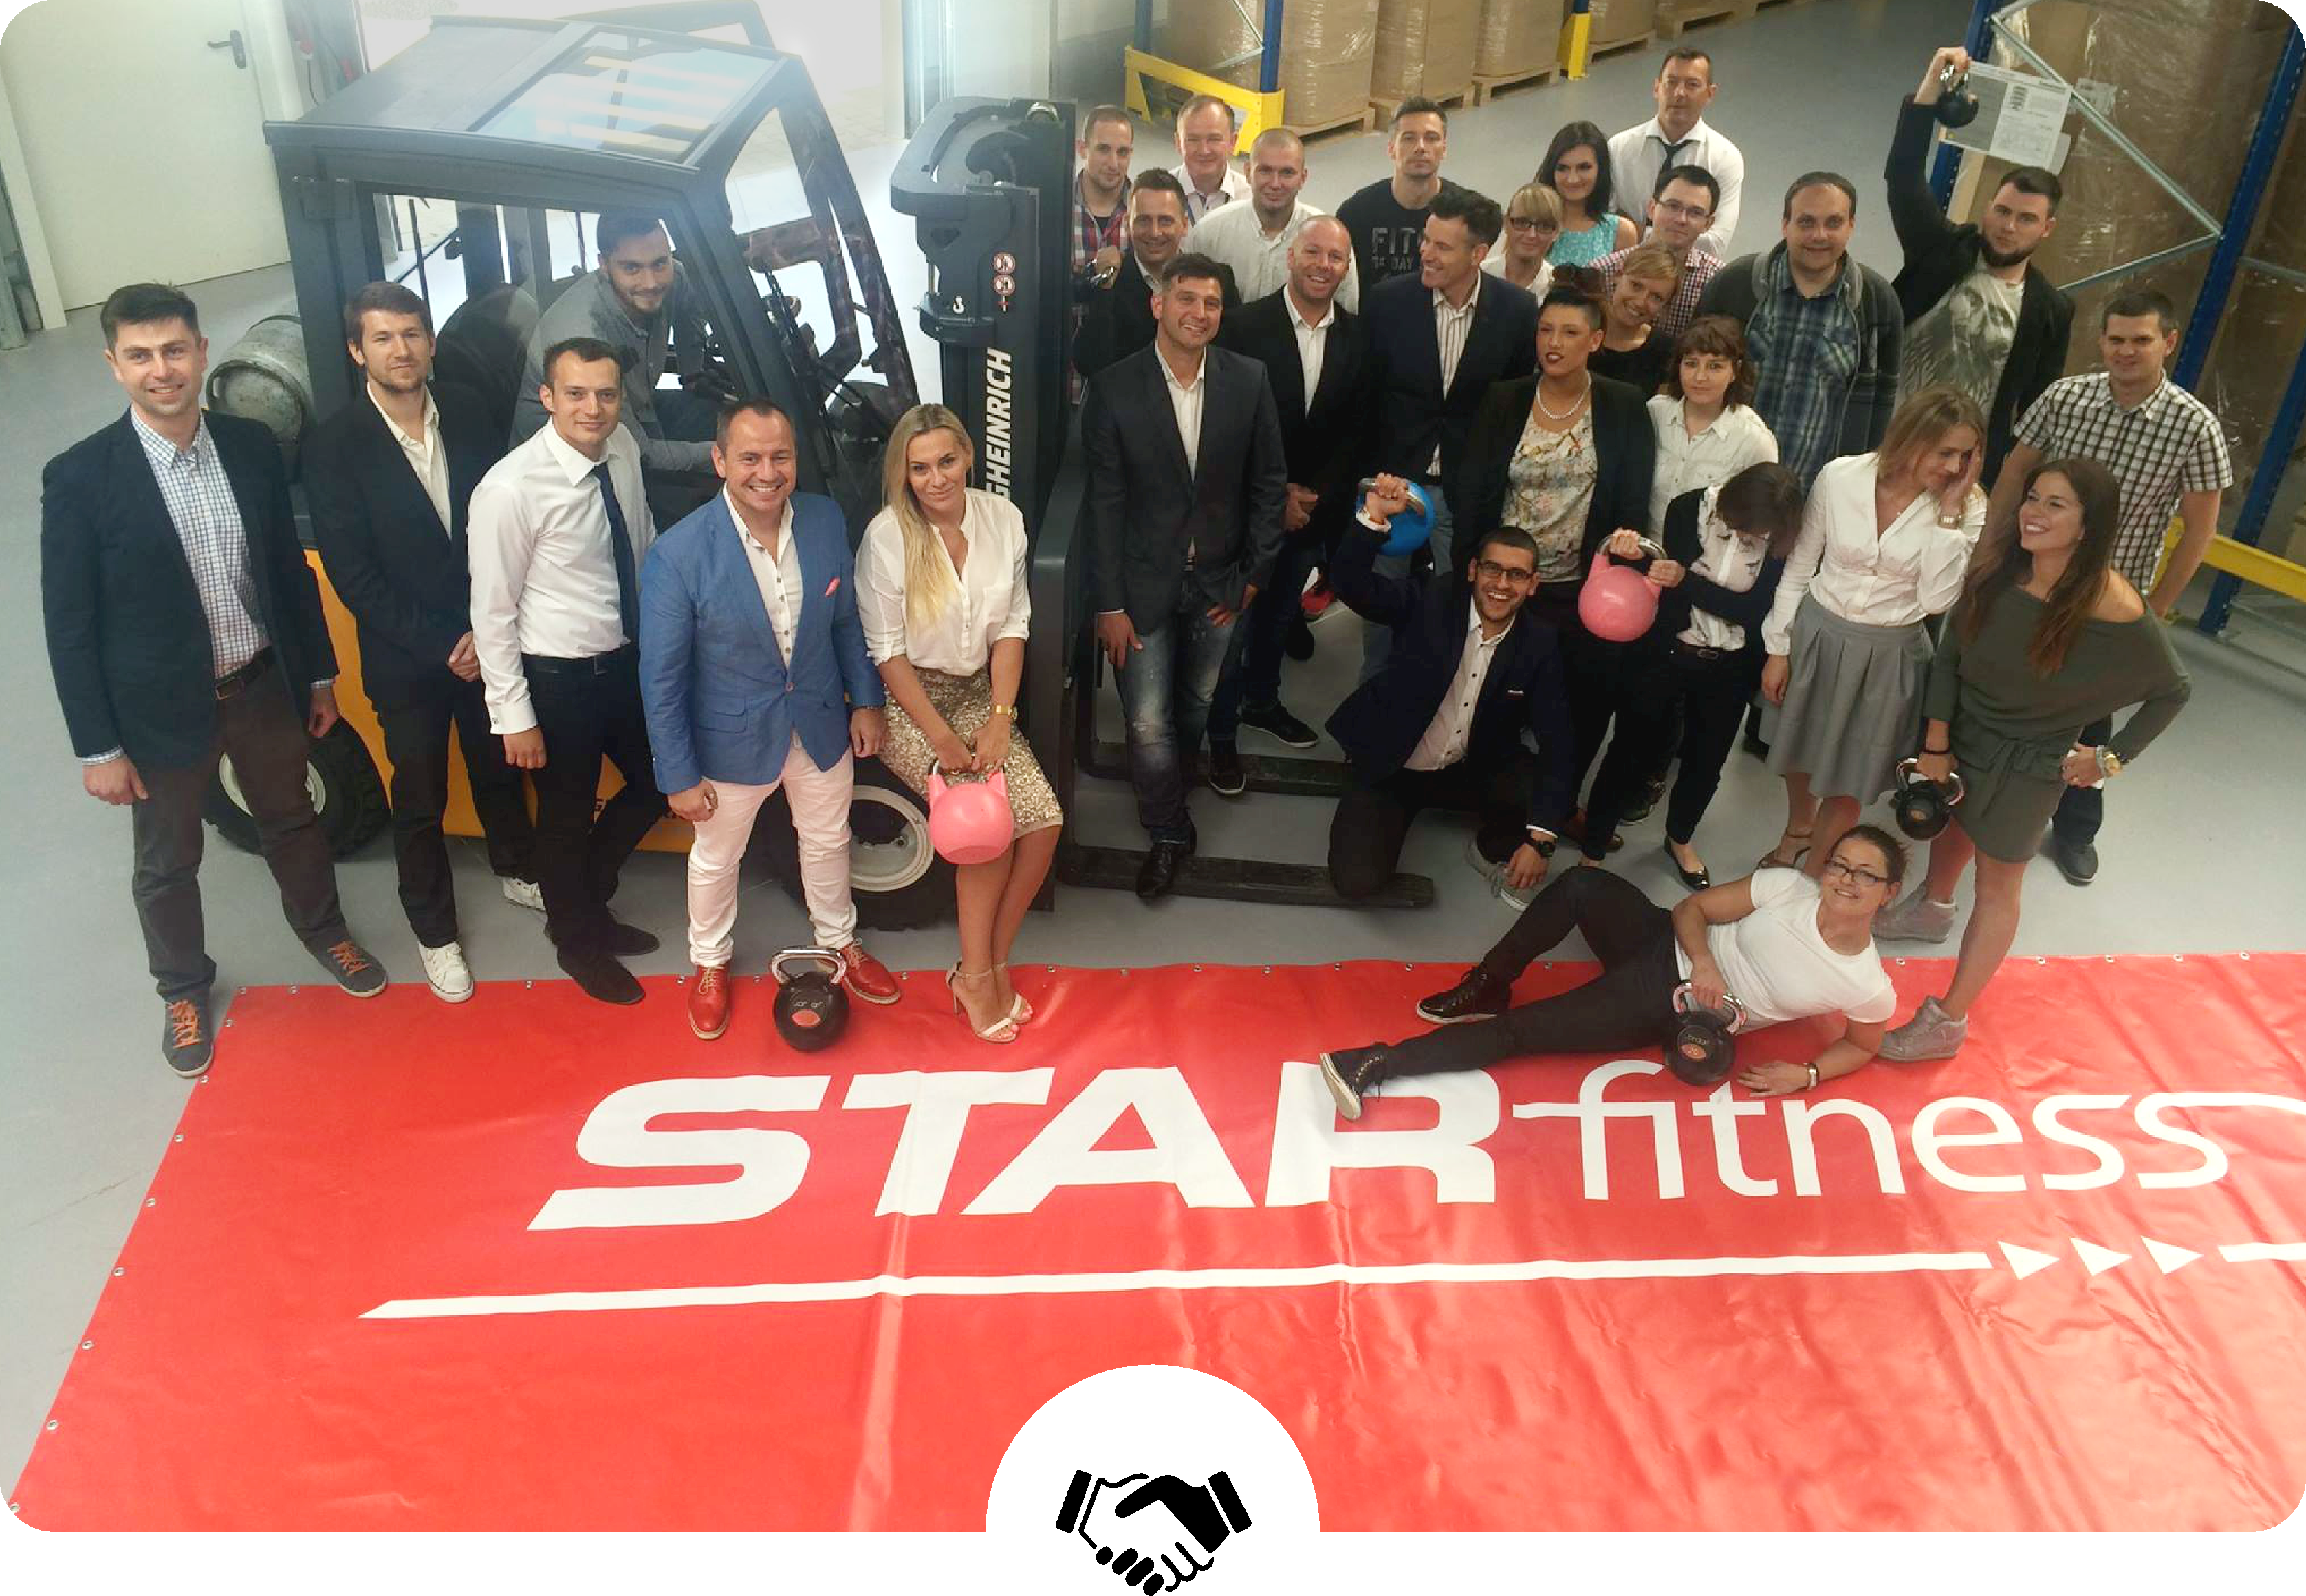 zespol star-fitness